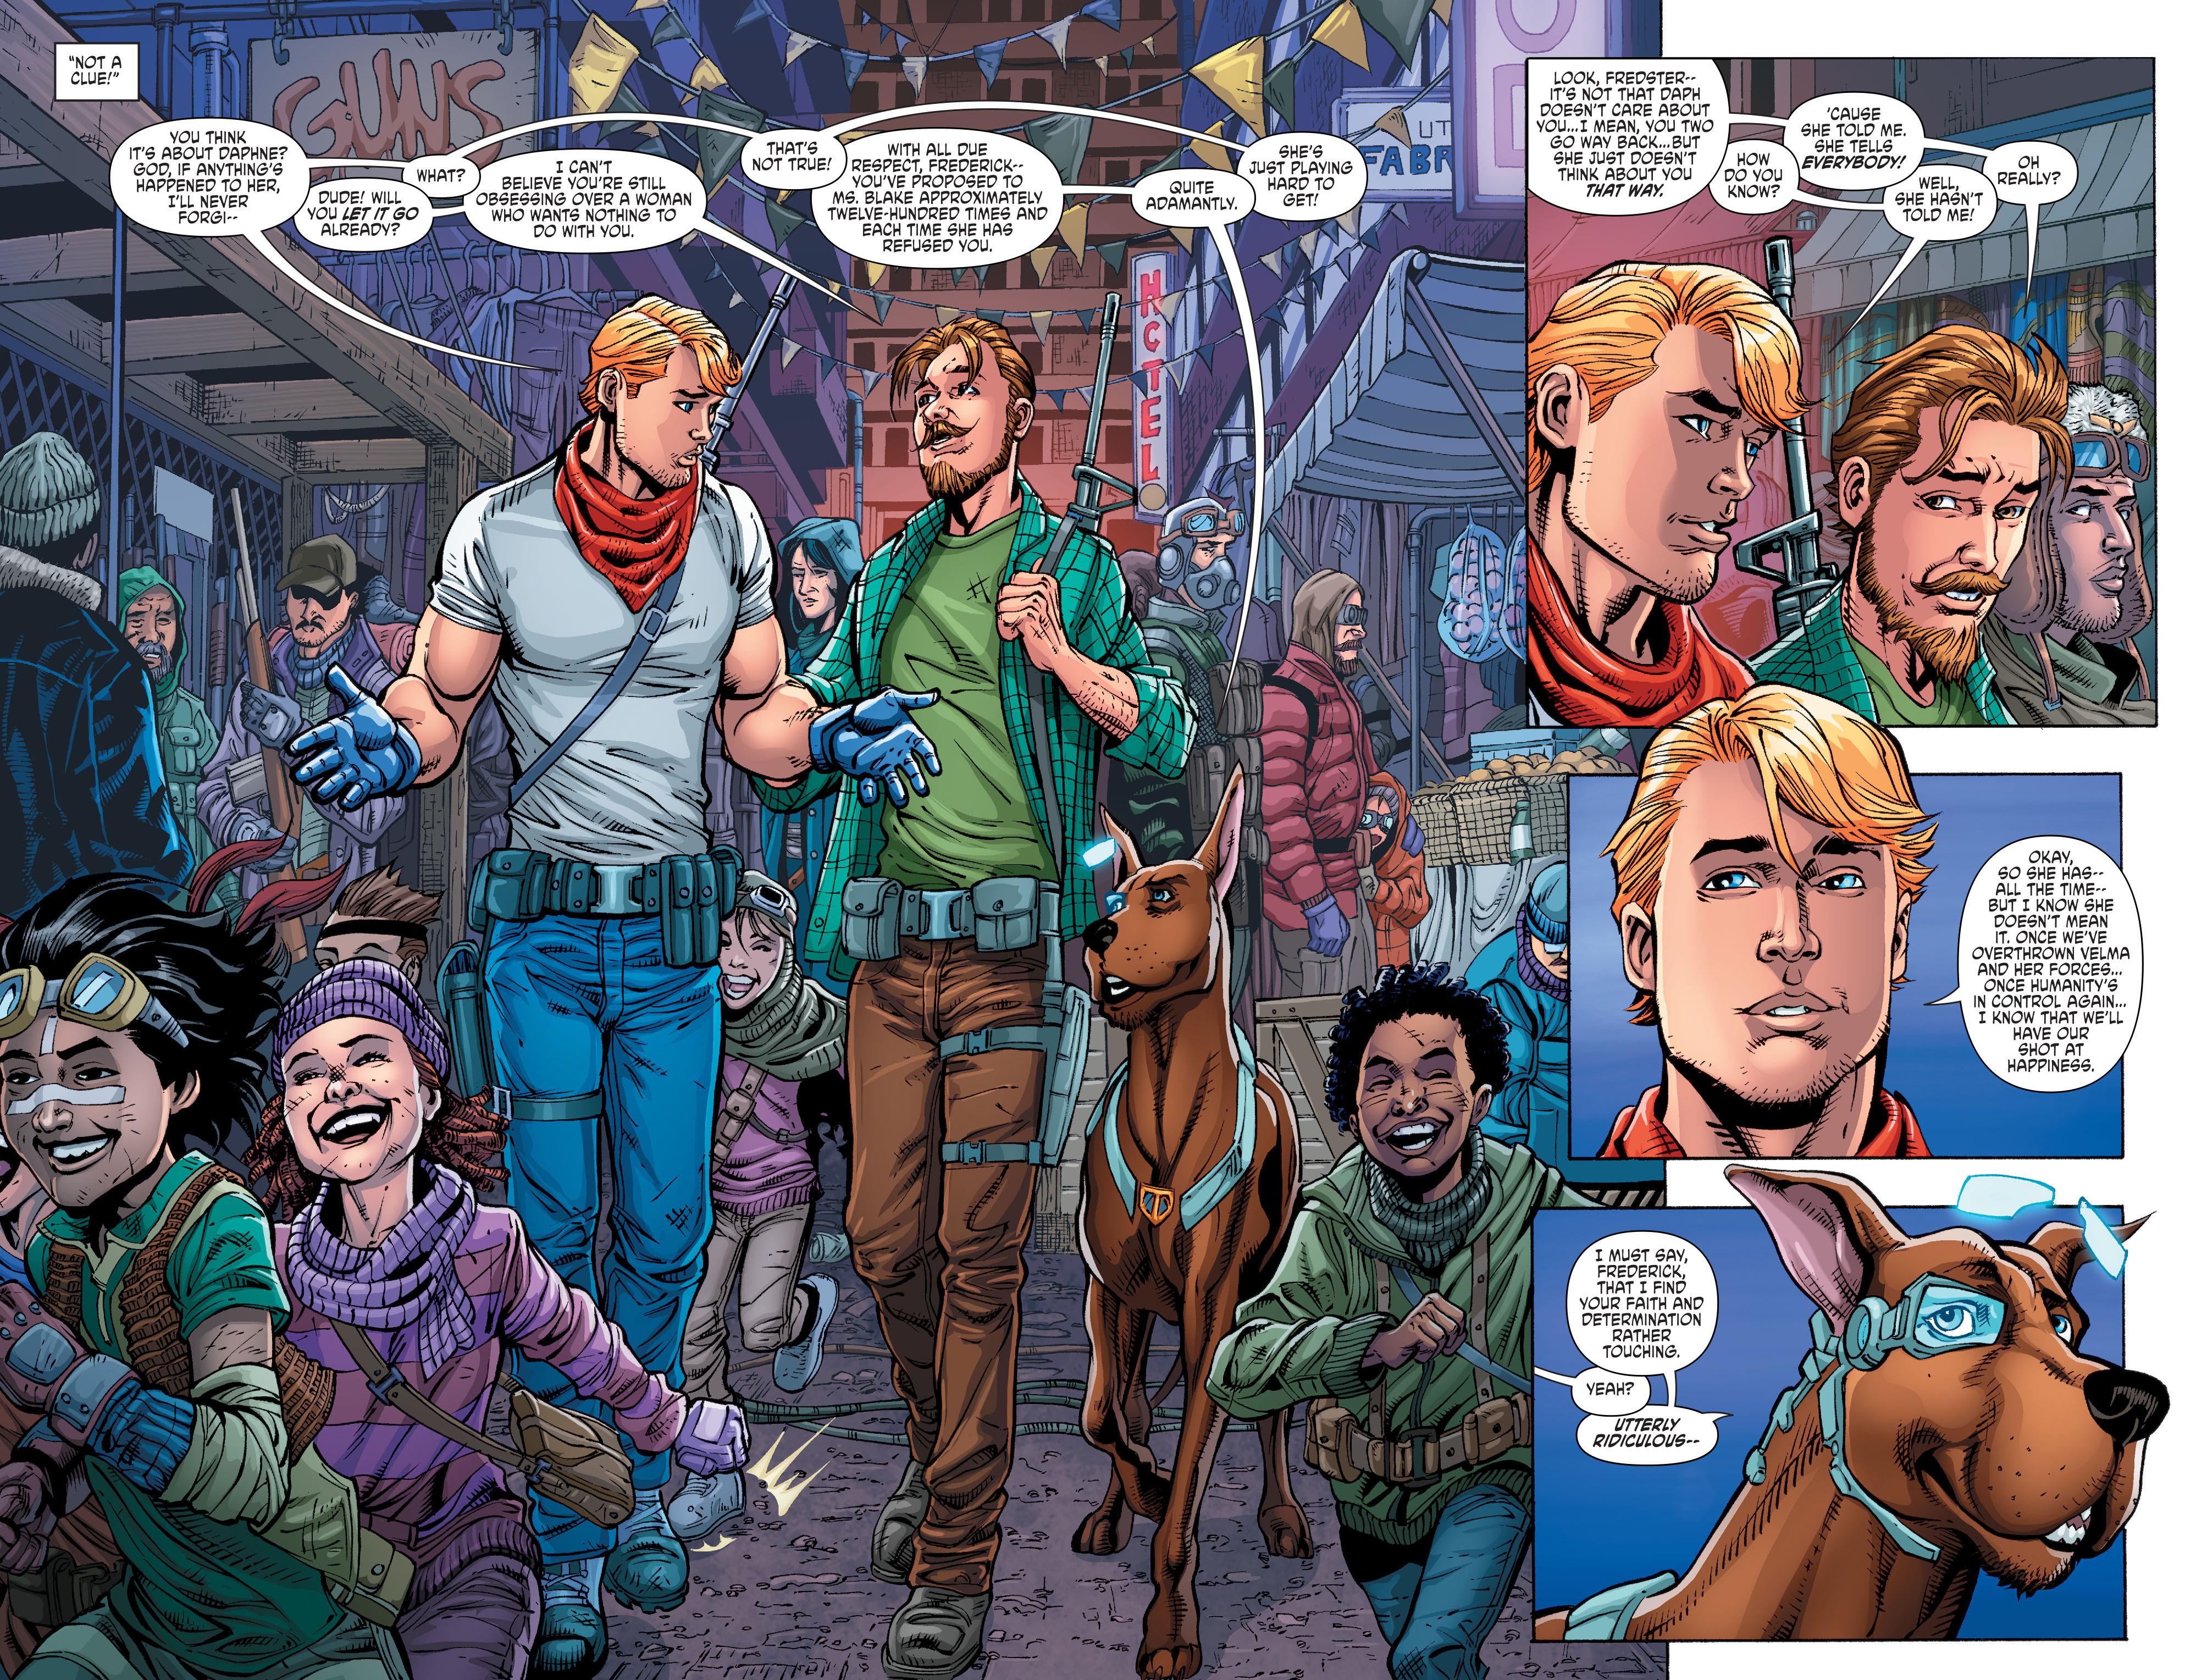 Read online Scooby Apocalypse comic -  Issue #10 - 10